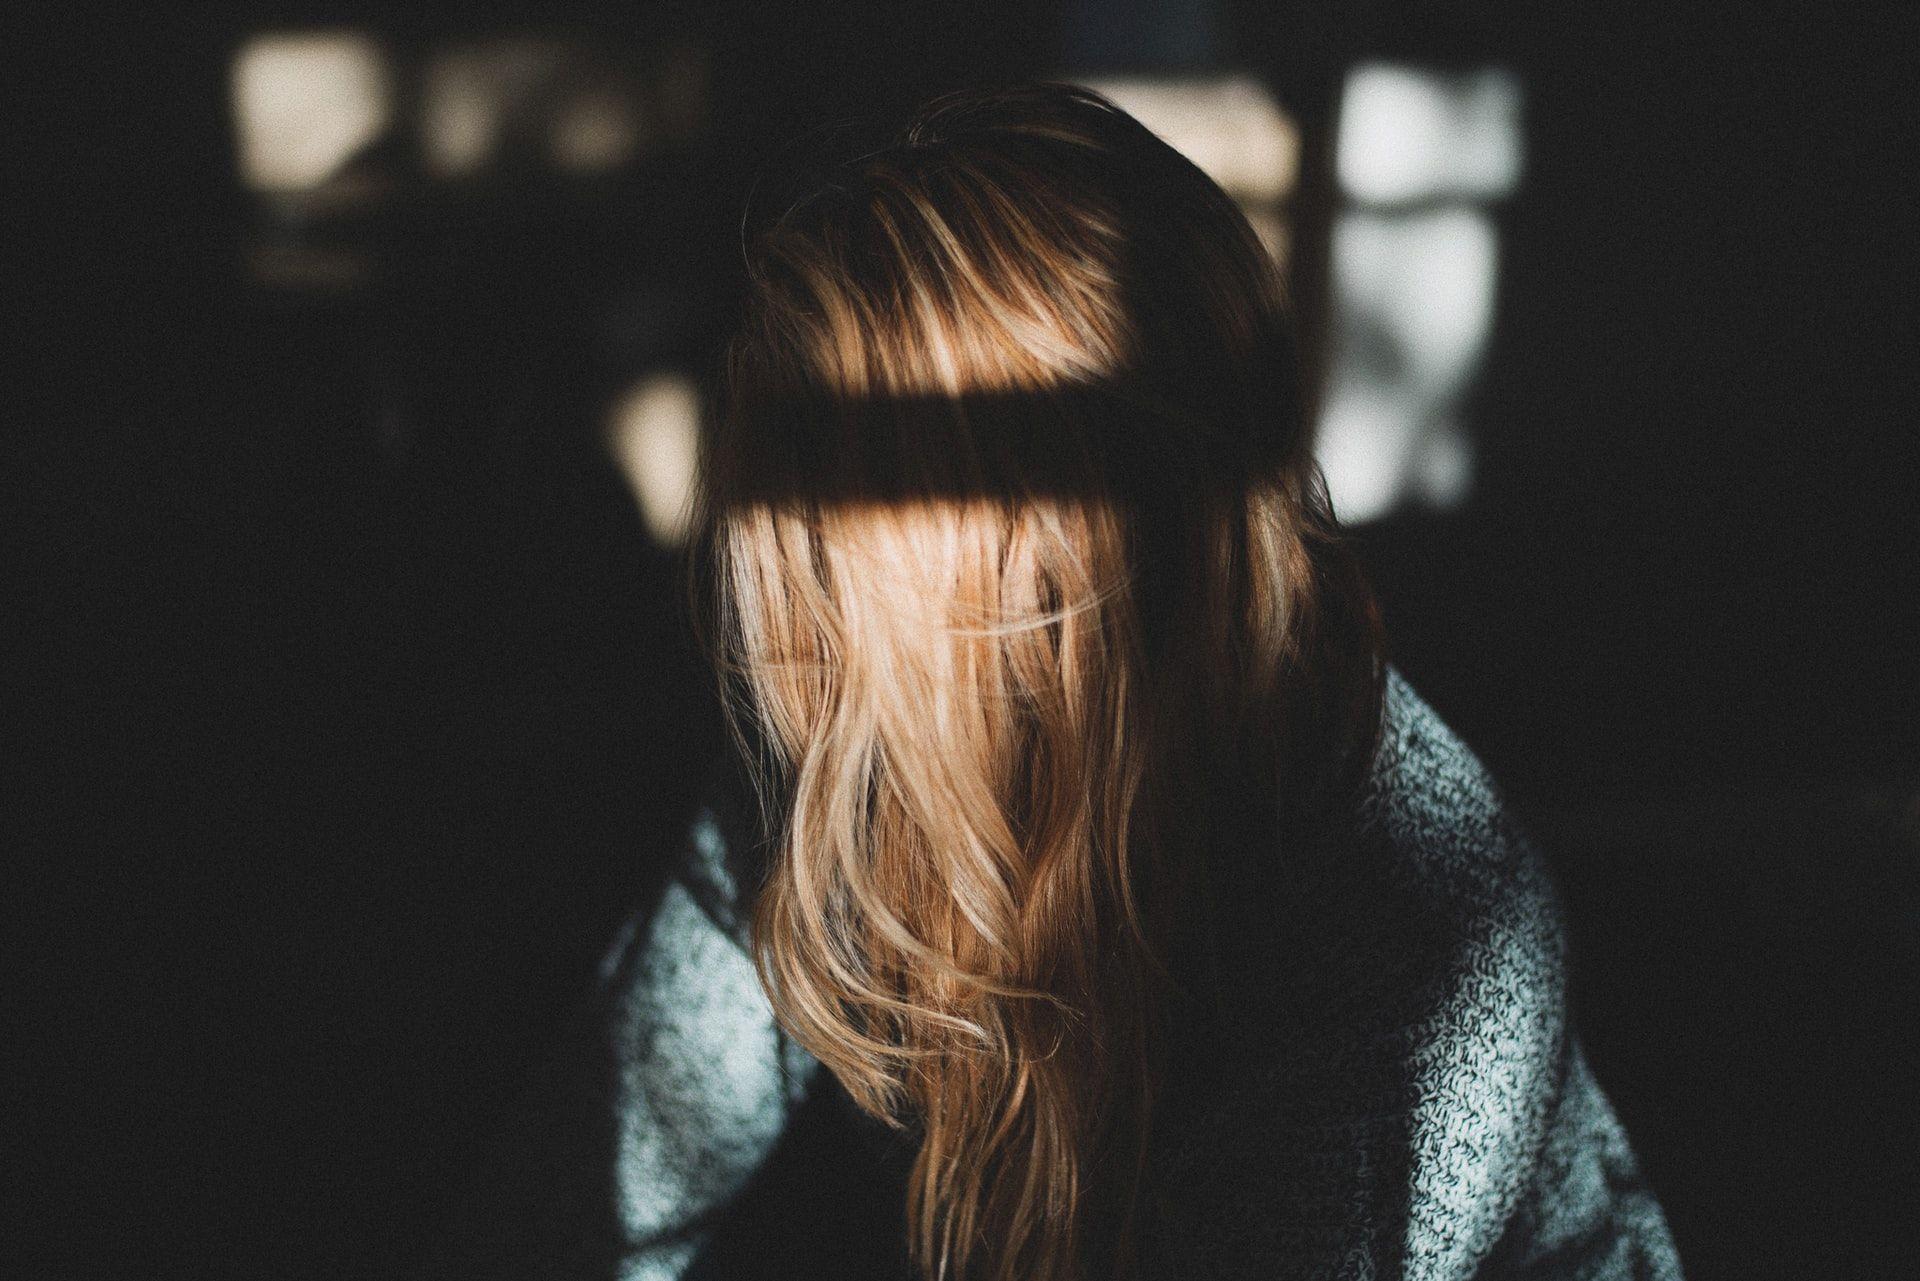 Veidą slepianti mergina